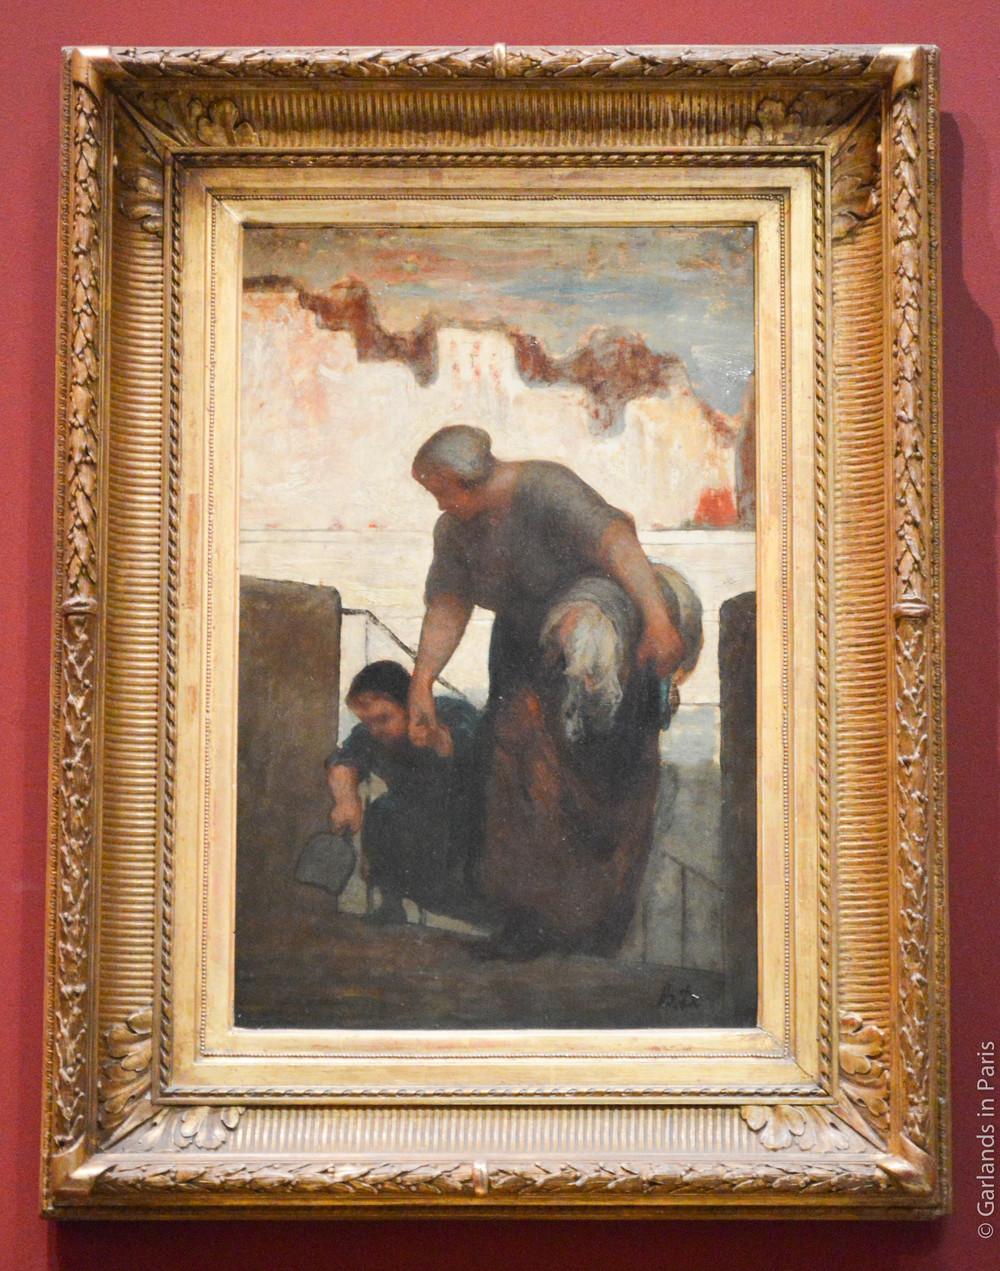 Daumier Mother, Musée d'Orsay